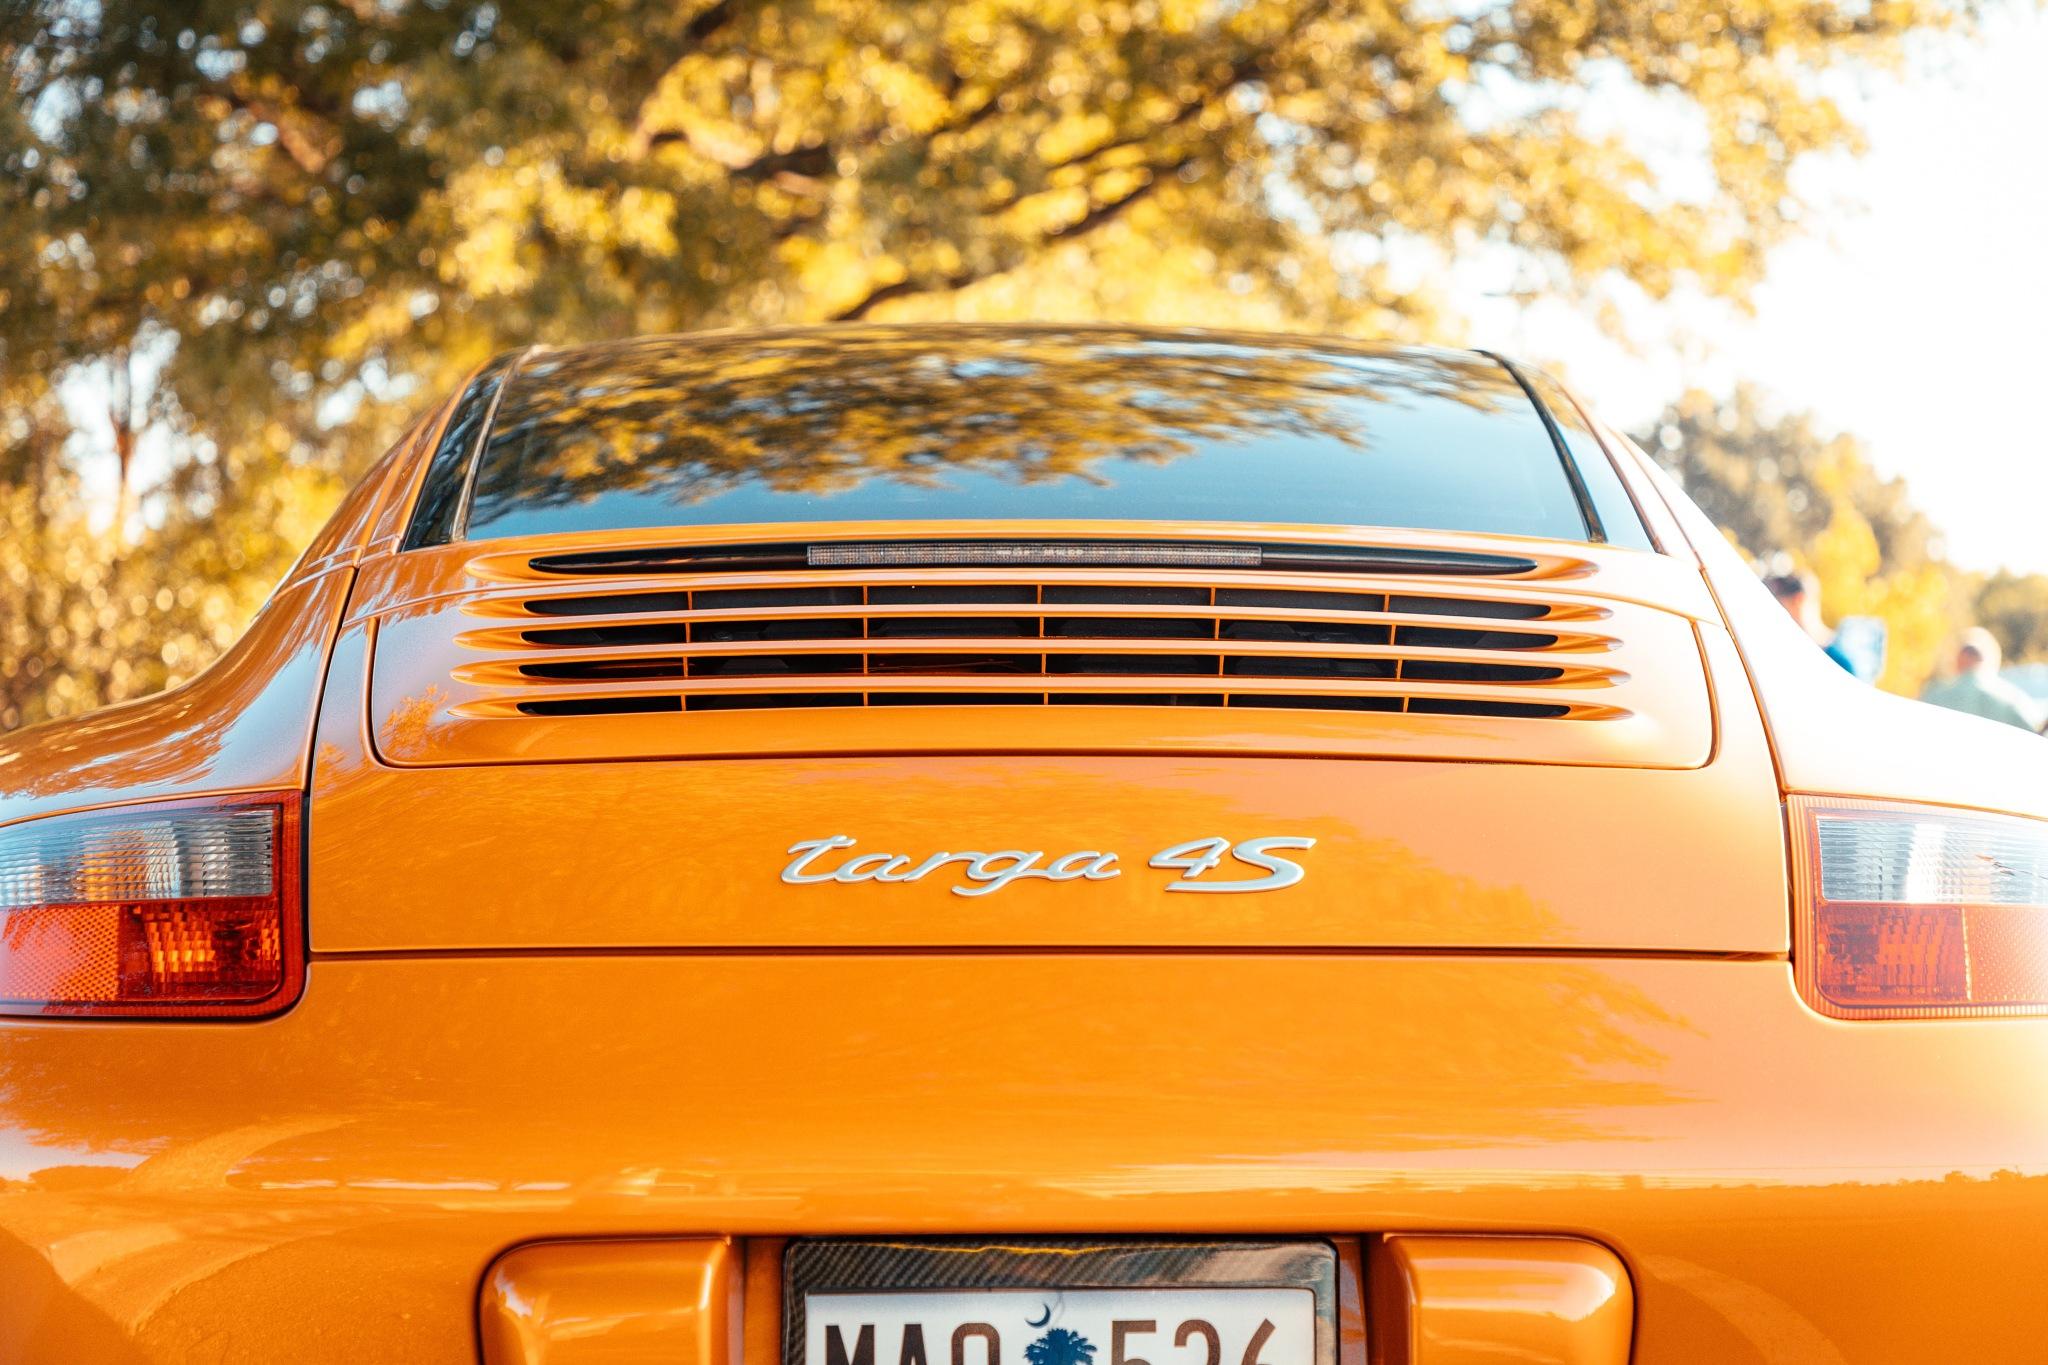 Targa 4S by David Cross